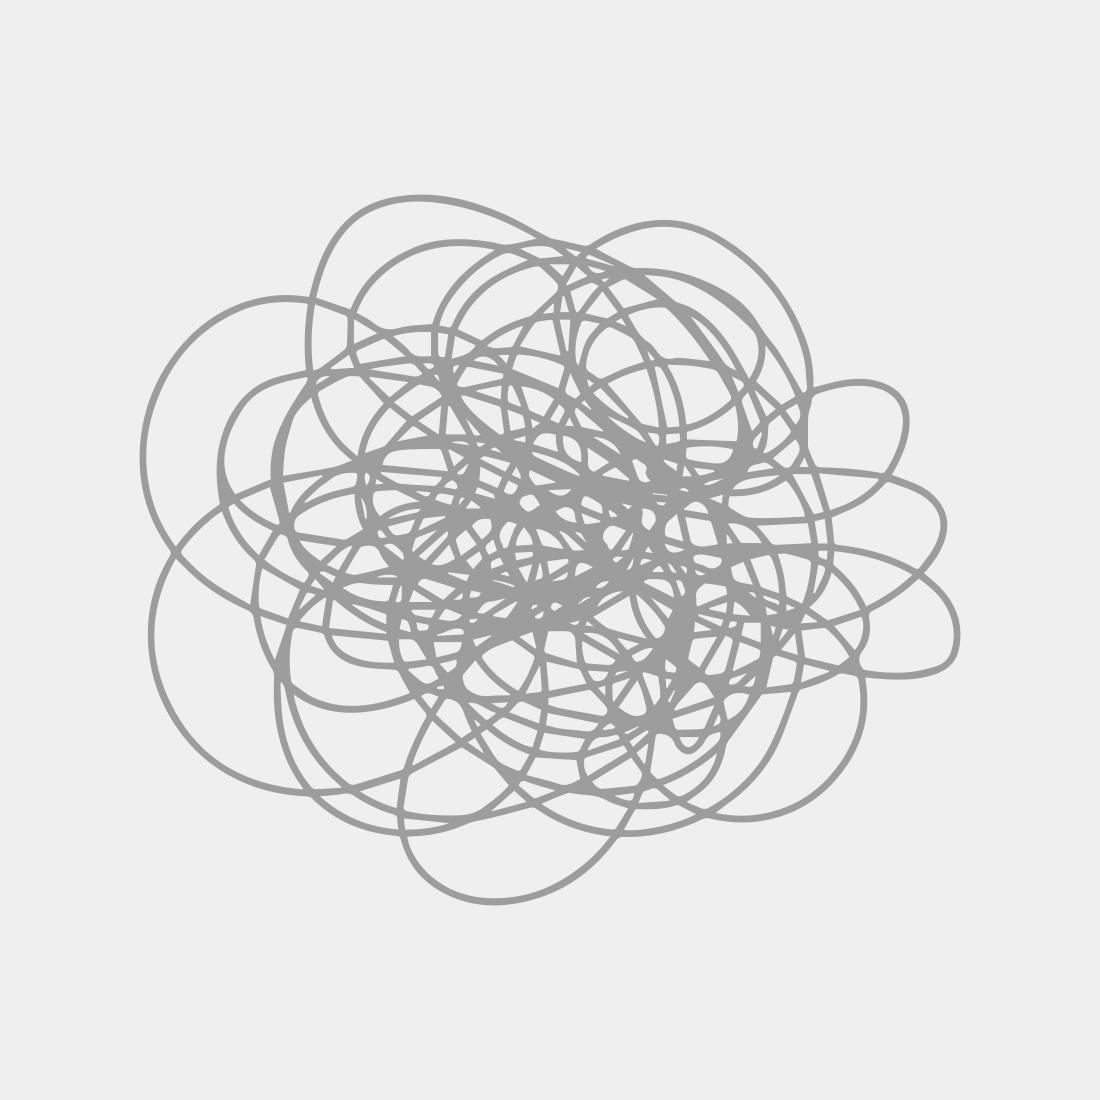 Hardback James Ensor Exhibition Catalogue